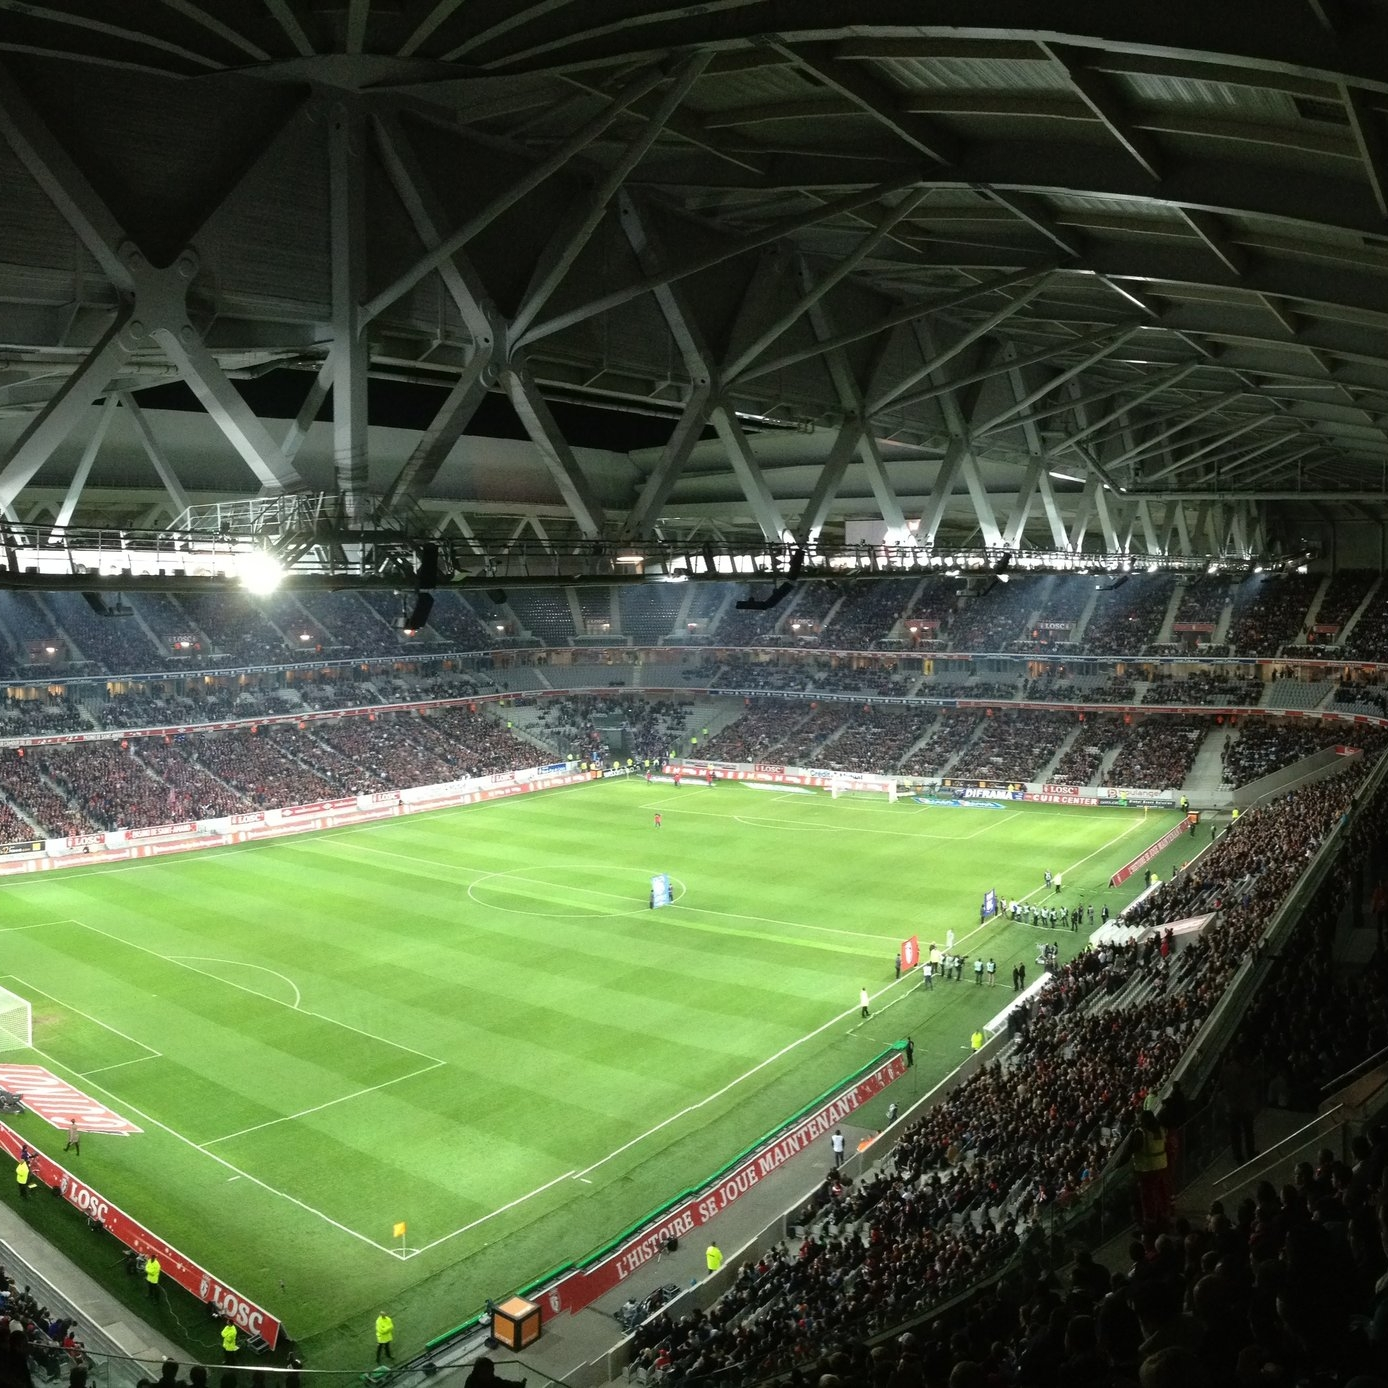 structure-lawn-football-stadium-baseball-field-arena-1118277-pxhere.com.jpg